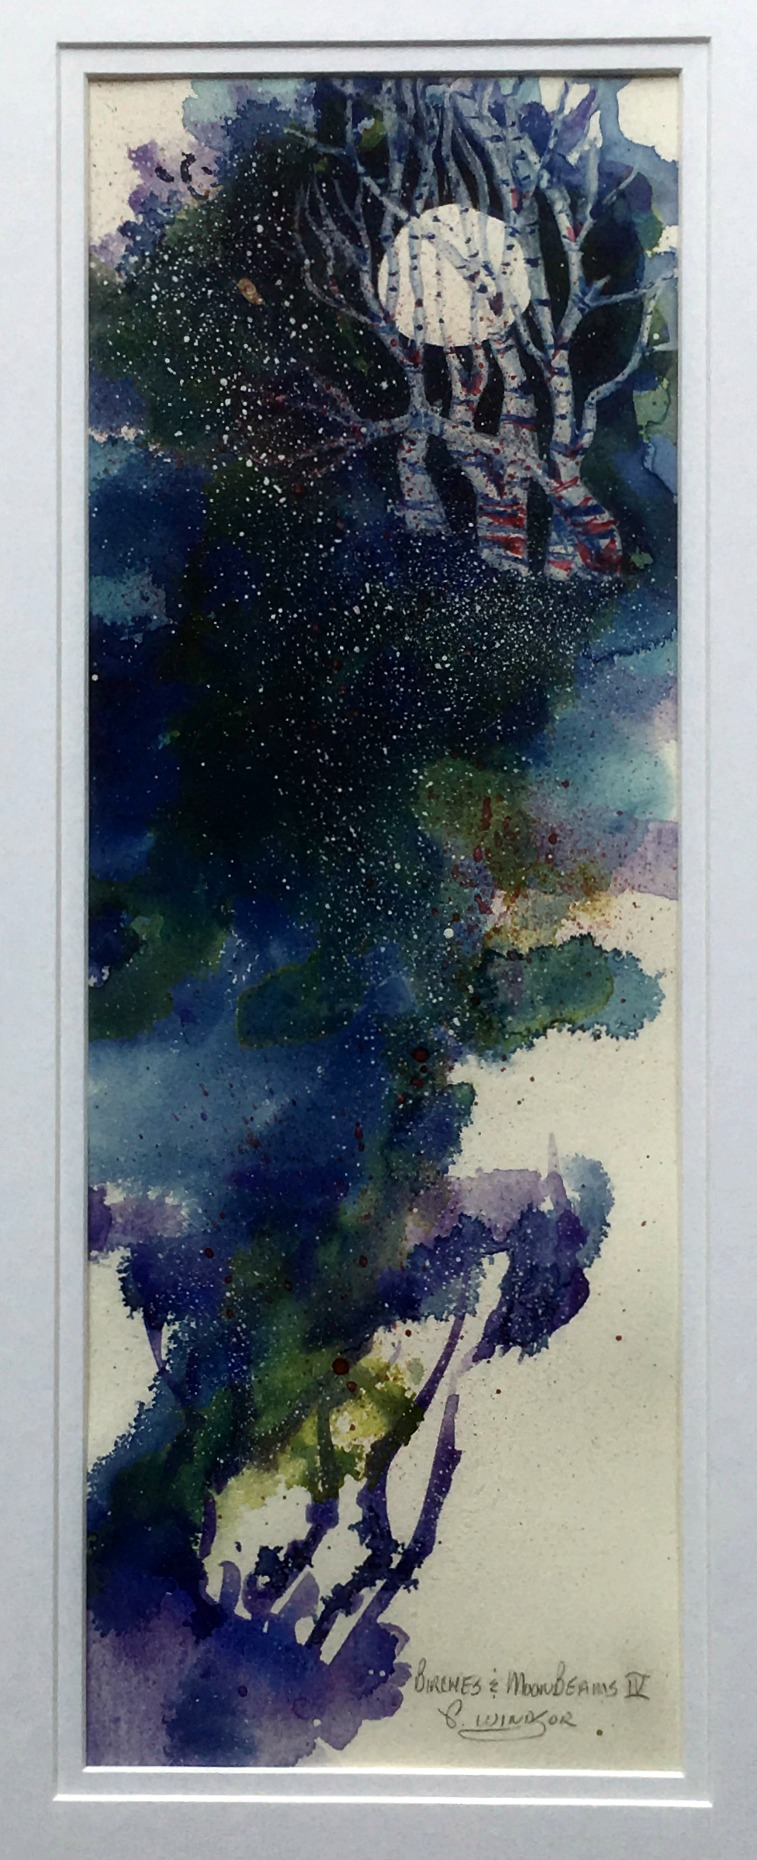 Birches & Moonbeams IV